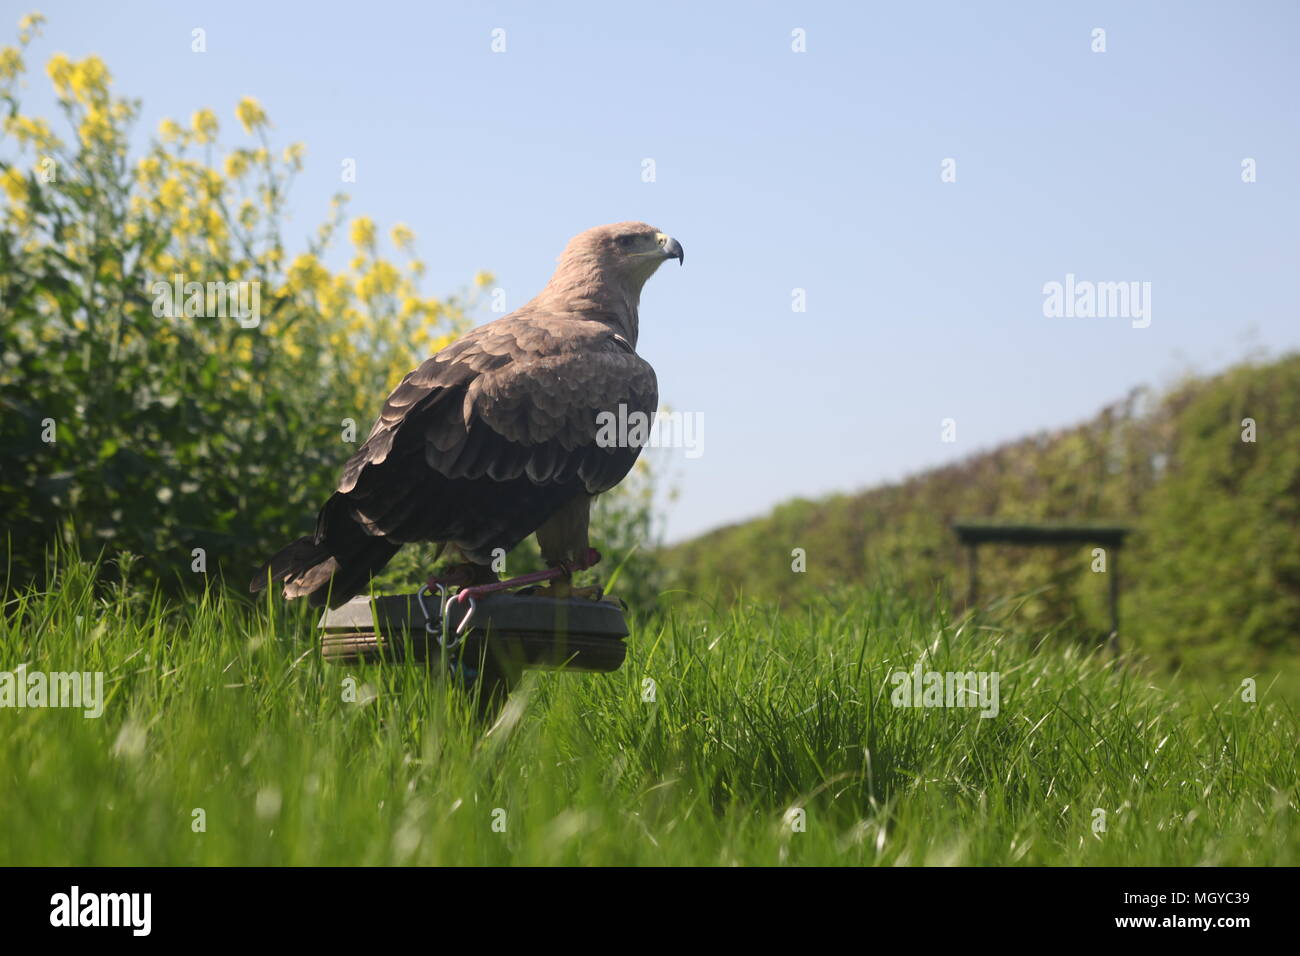 Taking Photos Of Birds Of Prey Is My Hobby Stock Photo